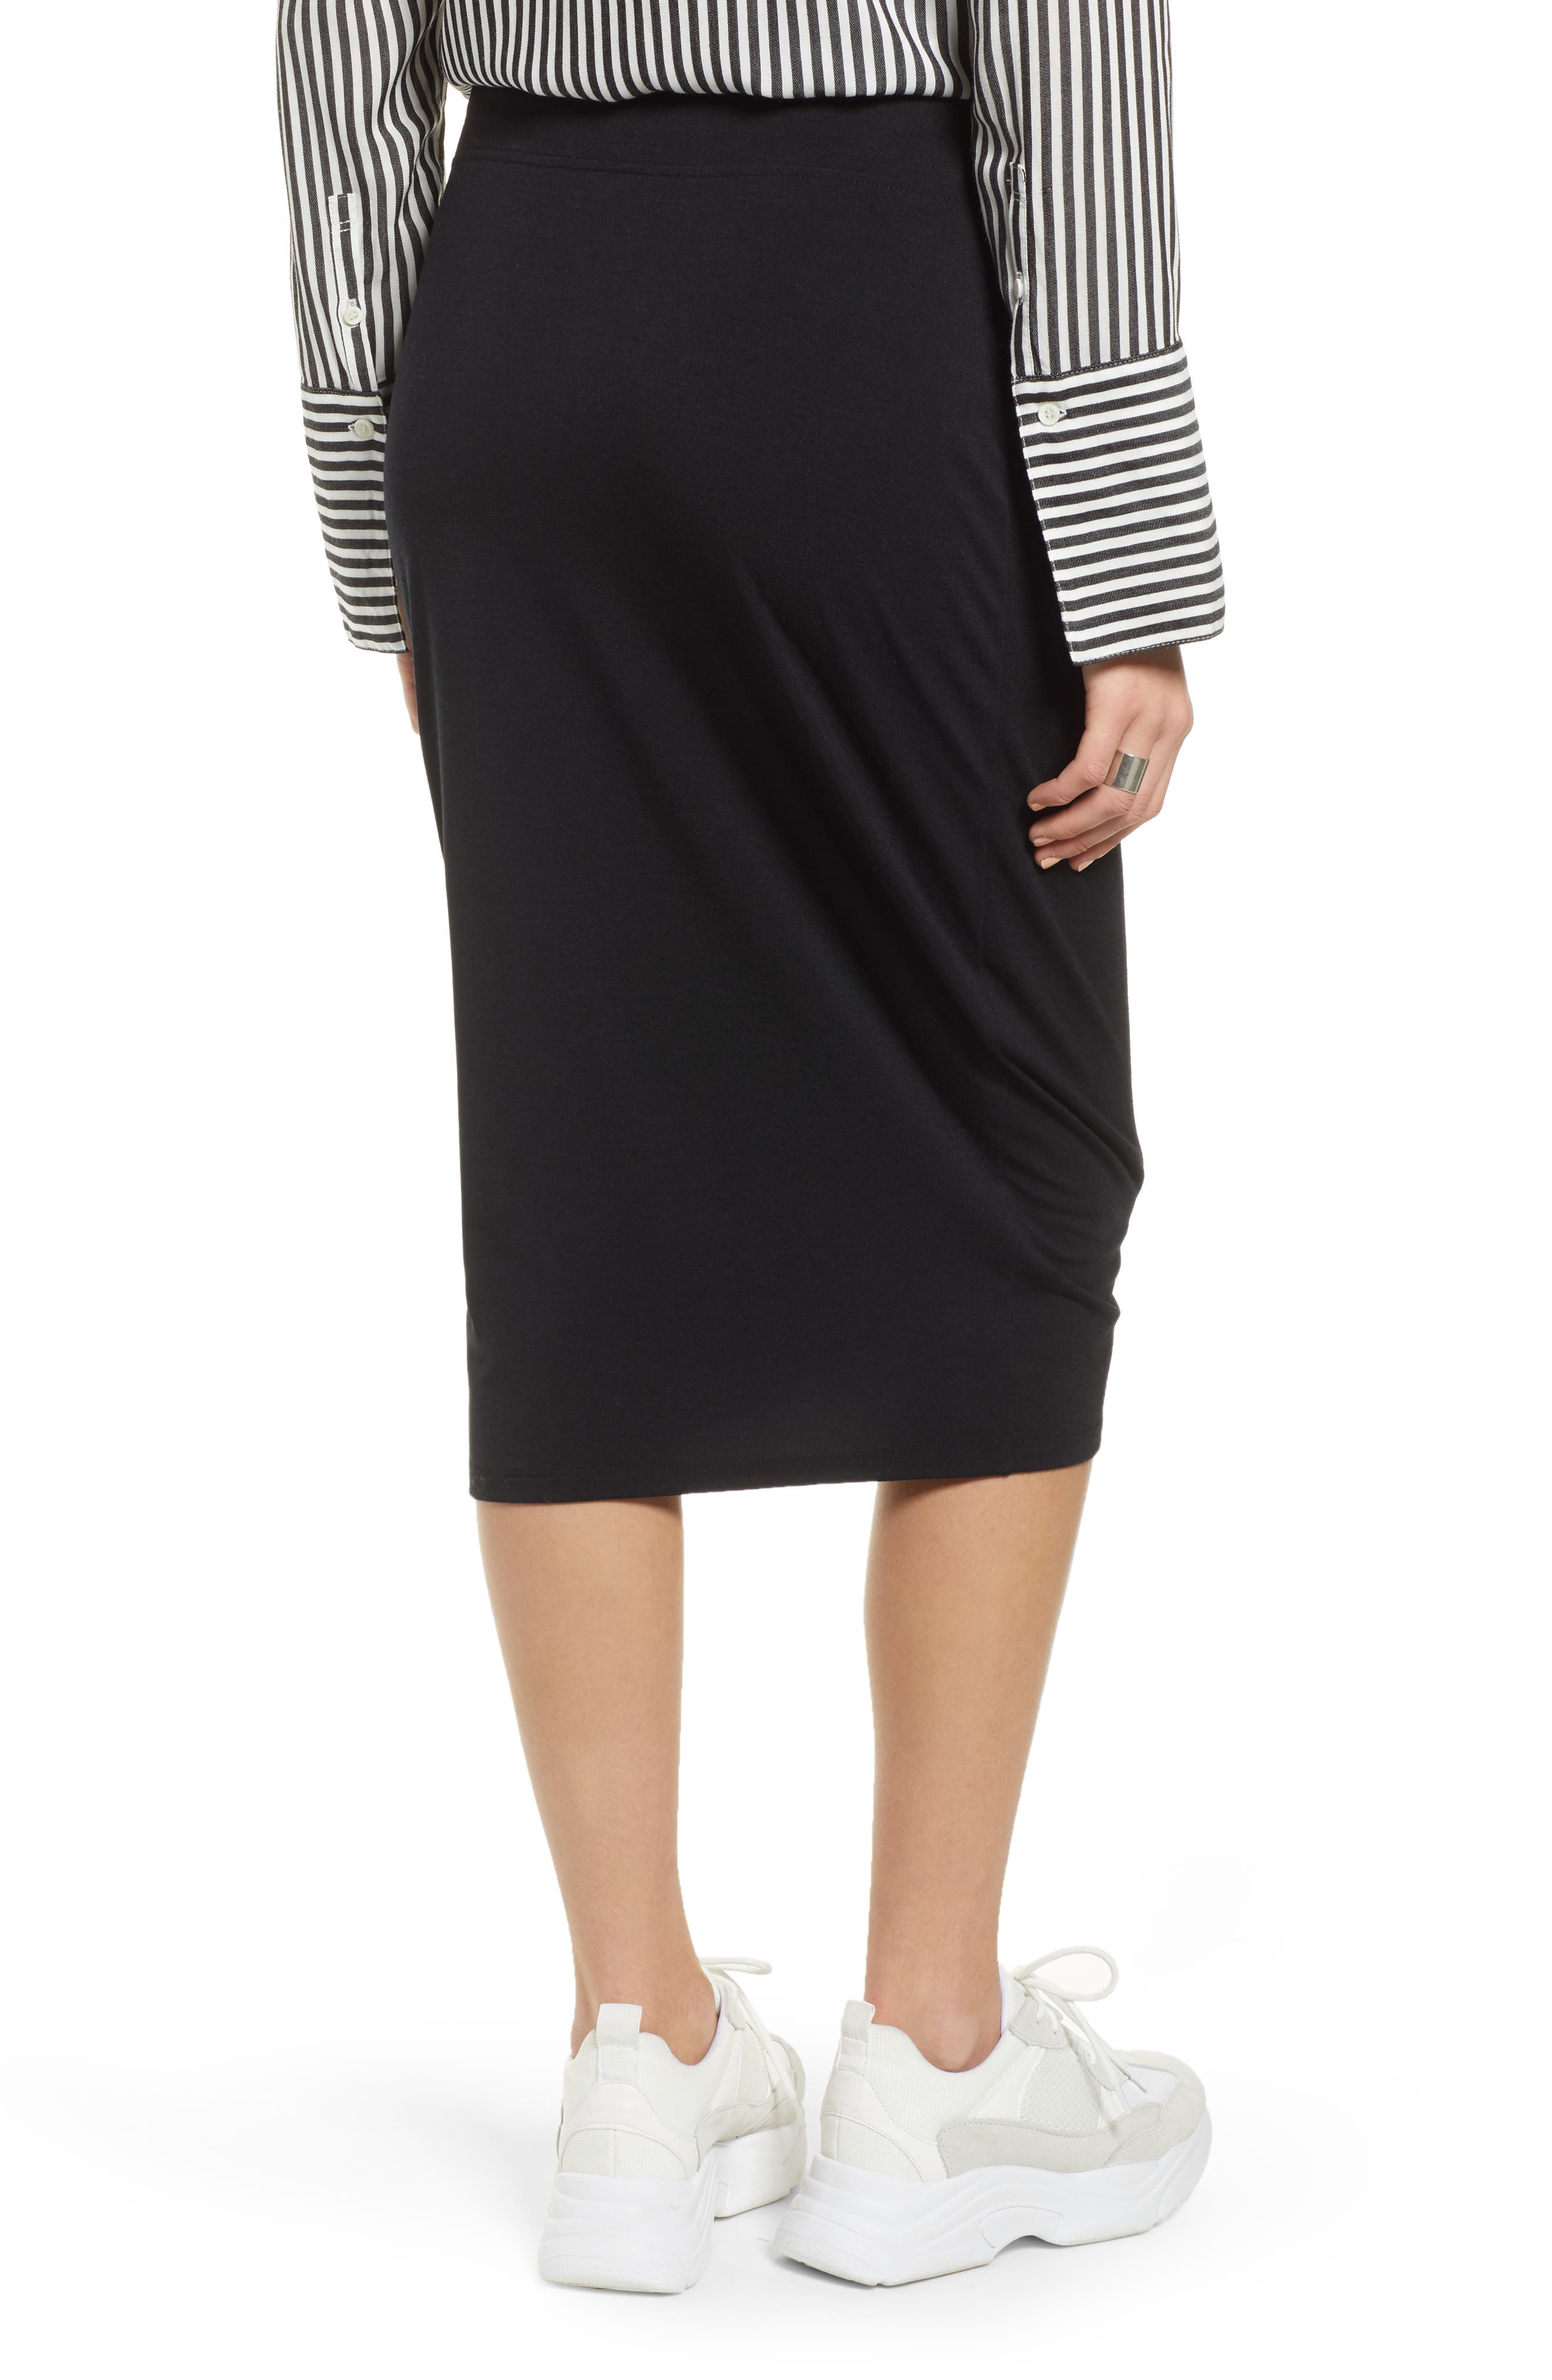 TREASURE & BOND, Shirred Side Midi Skirt, Alternate thumbnail 2, color, BLACK